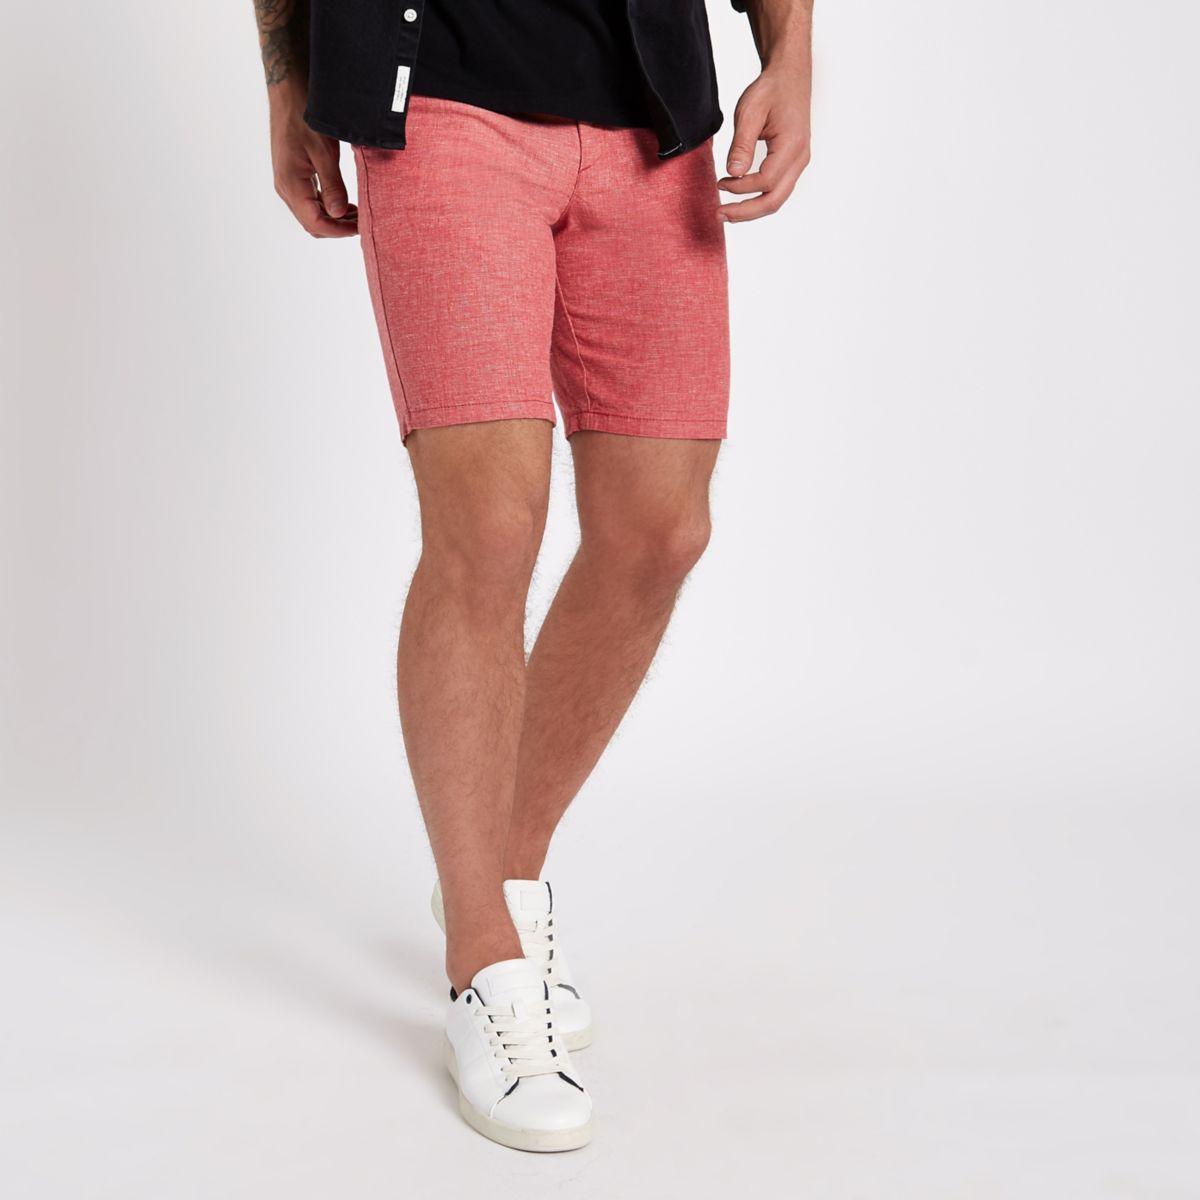 Coral slim fit Oxford chino shorts